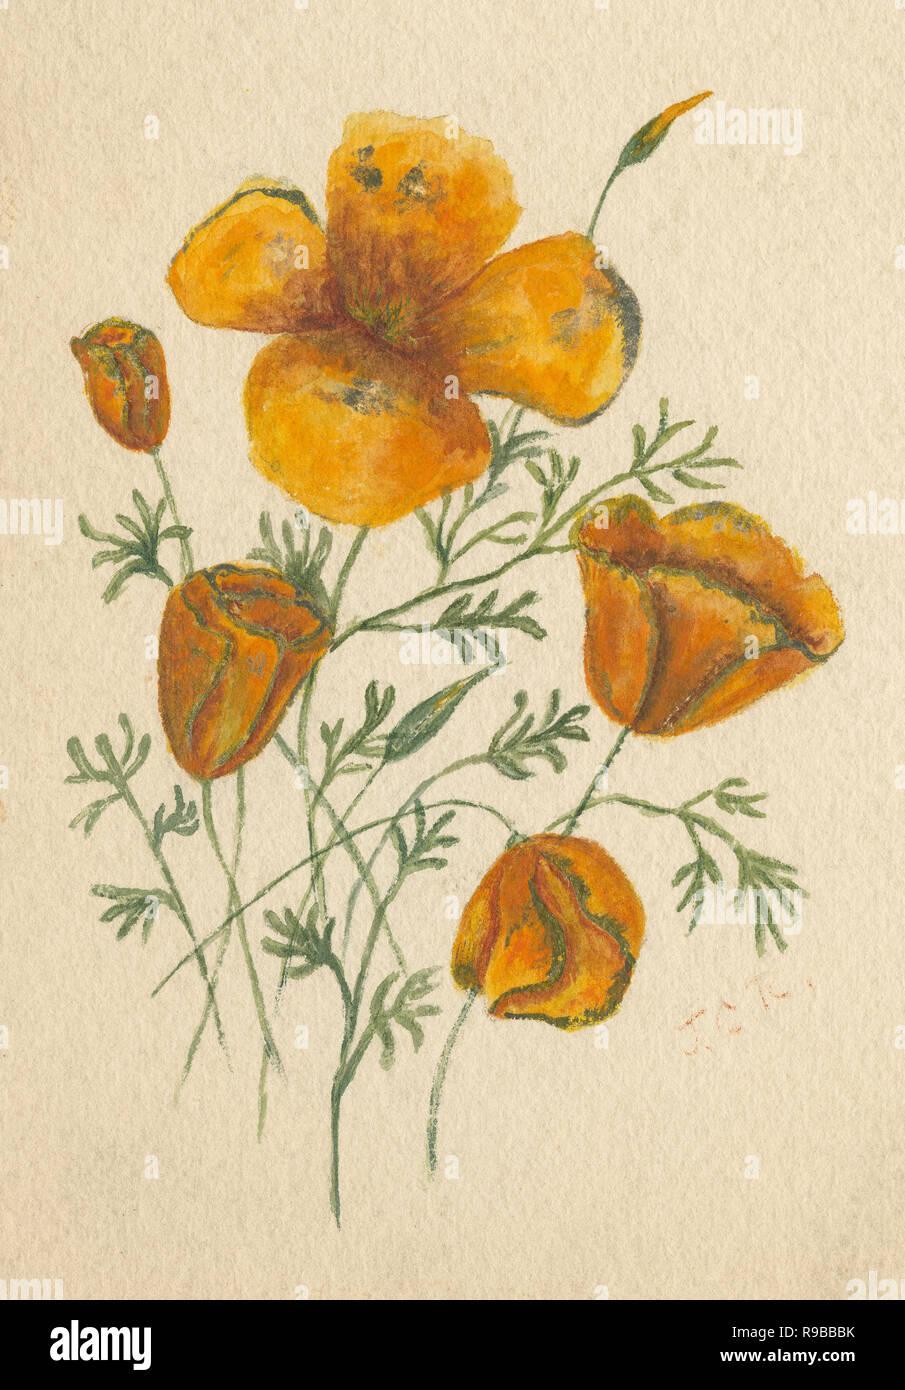 Antique c1890 de acuarela de amapola de California (eschscholzia californica). Fuente: Pintura original Imagen De Stock